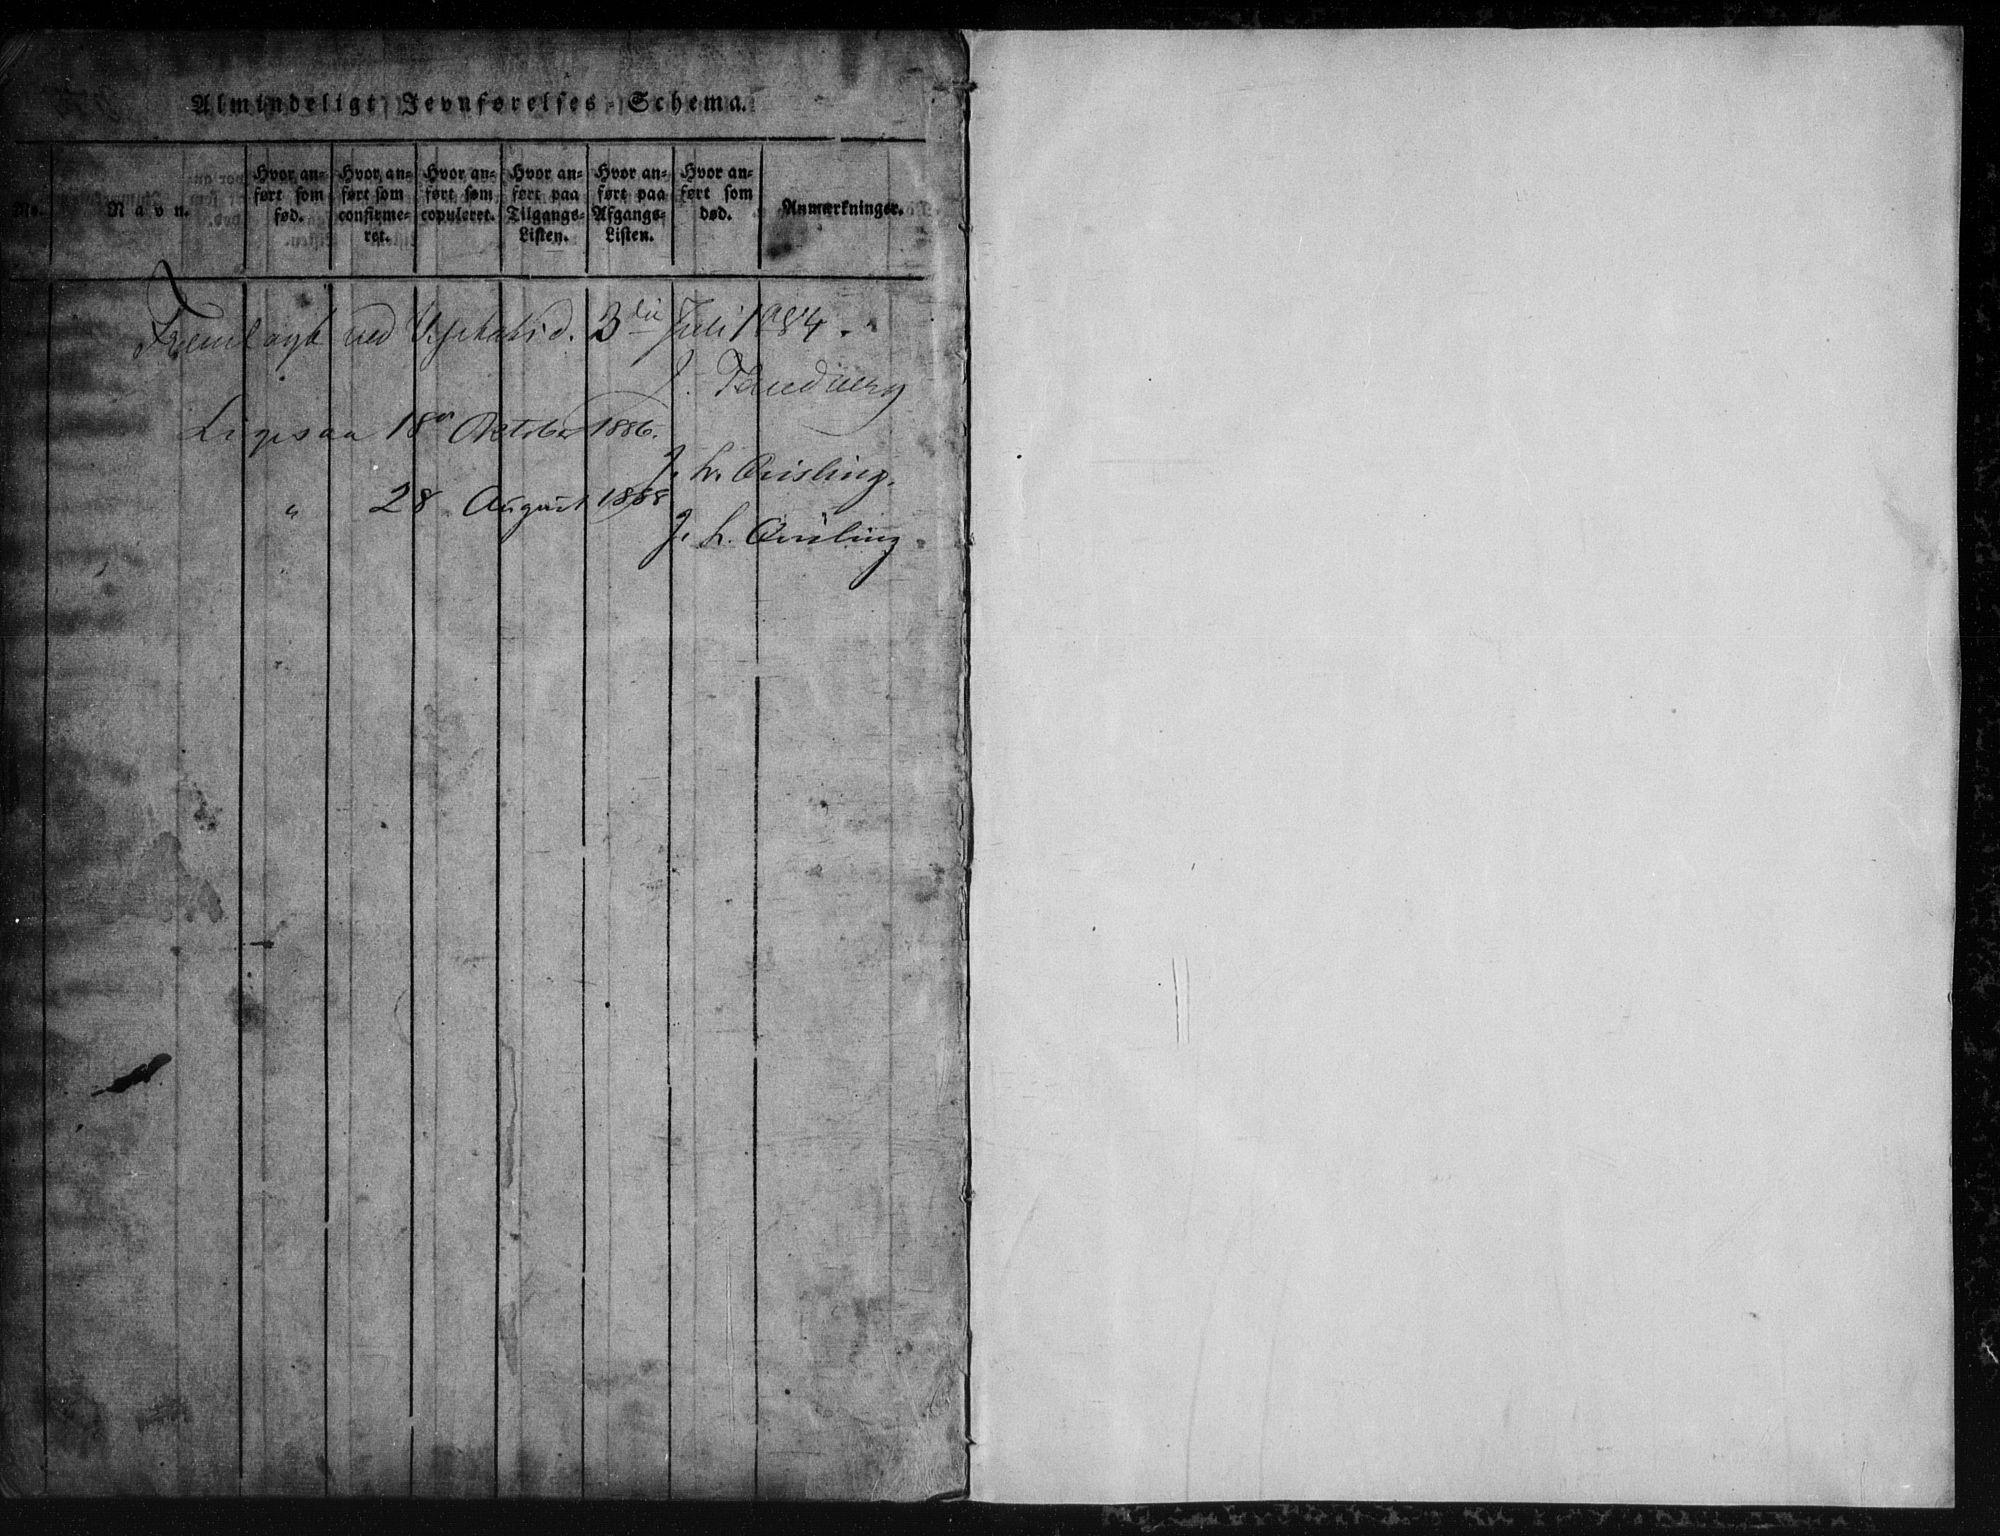 SAKO, Rauland kirkebøker, G/Gb/L0001: Klokkerbok nr. II 1, 1815-1886